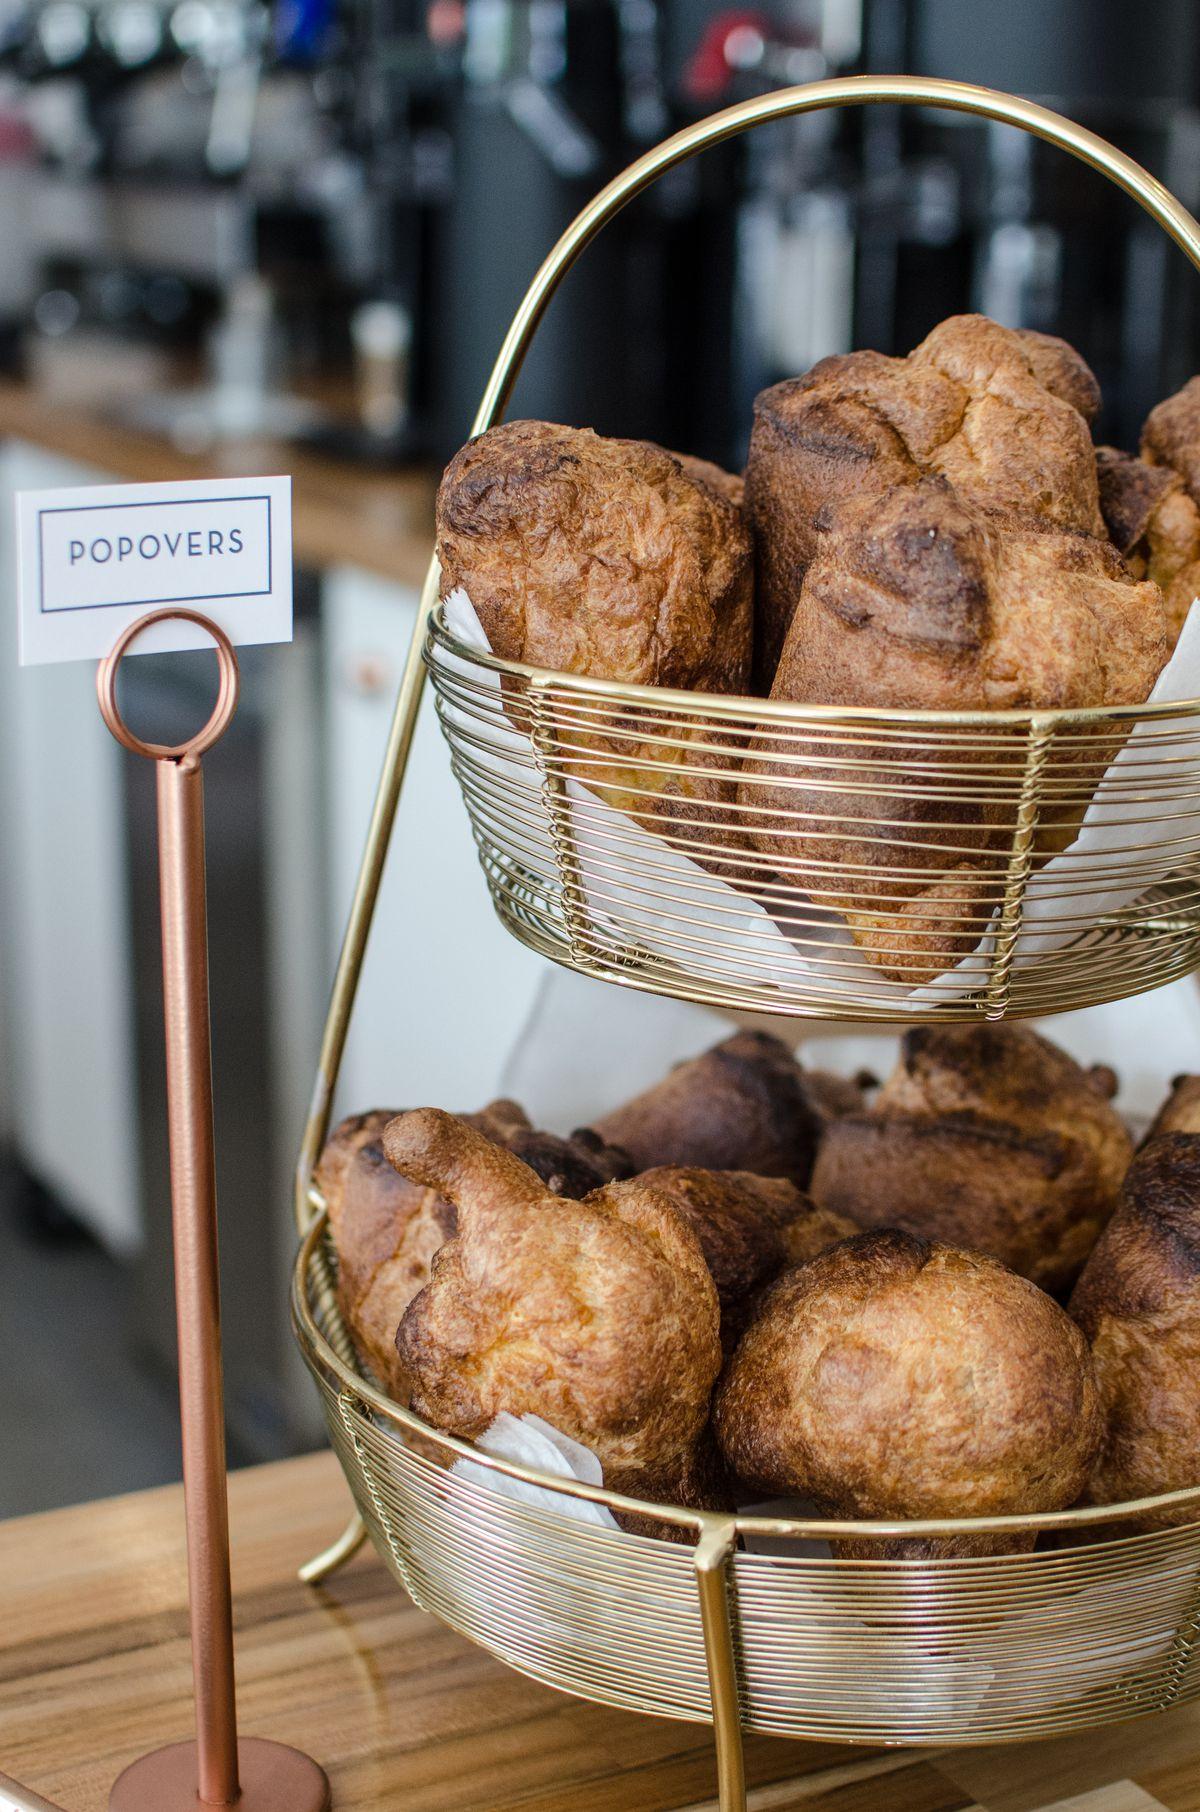 Popovers at NOCA Provisions